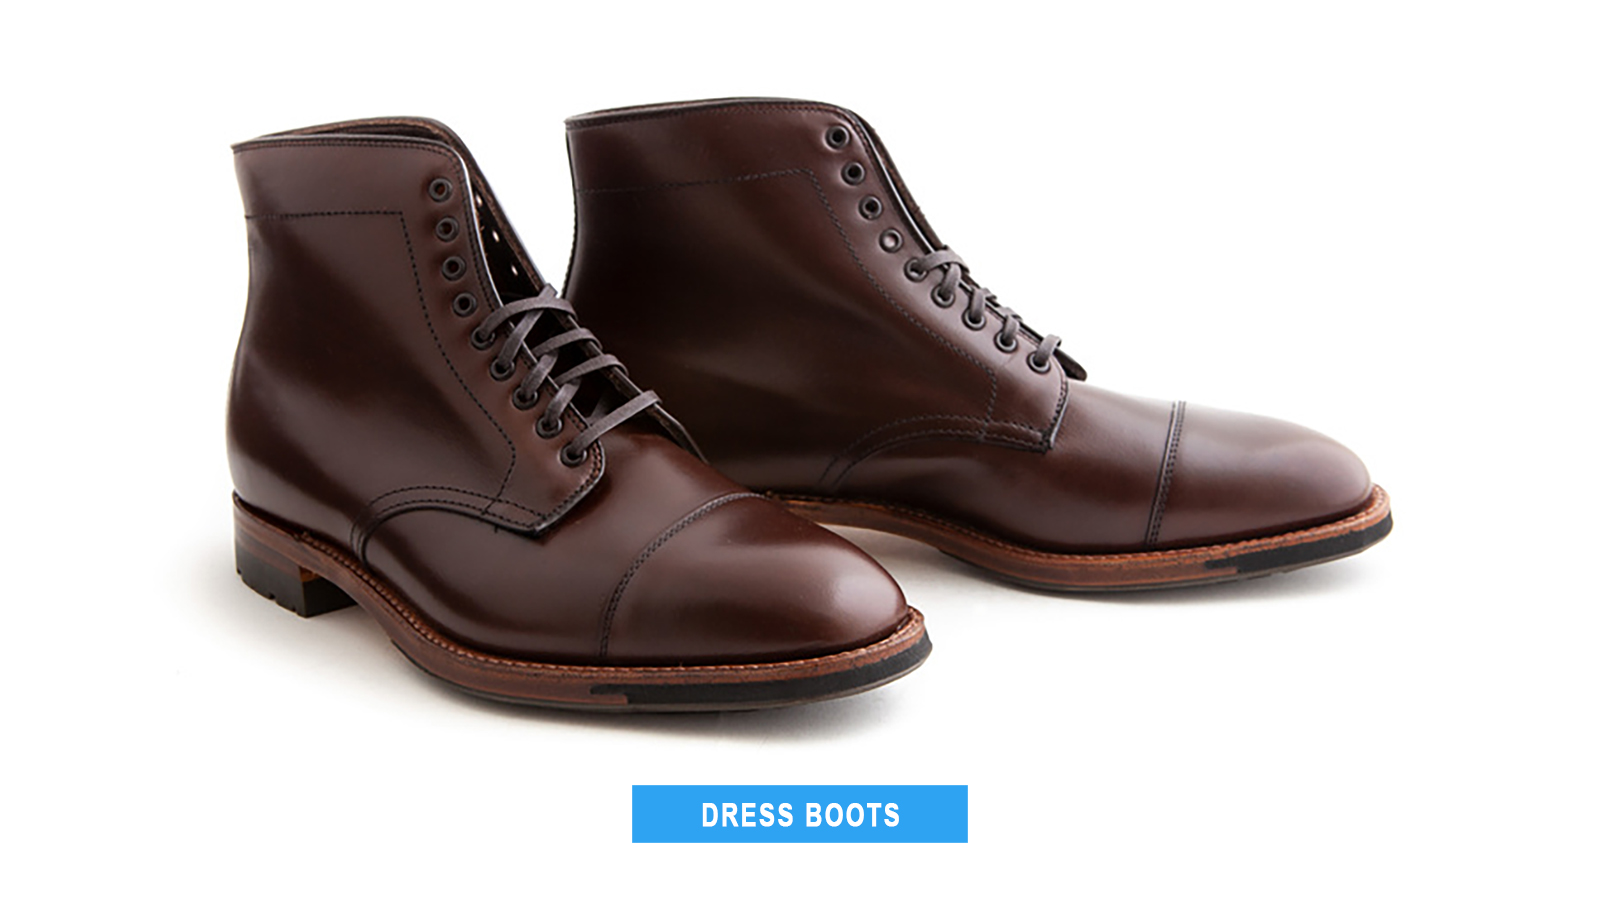 dress boot shoe style